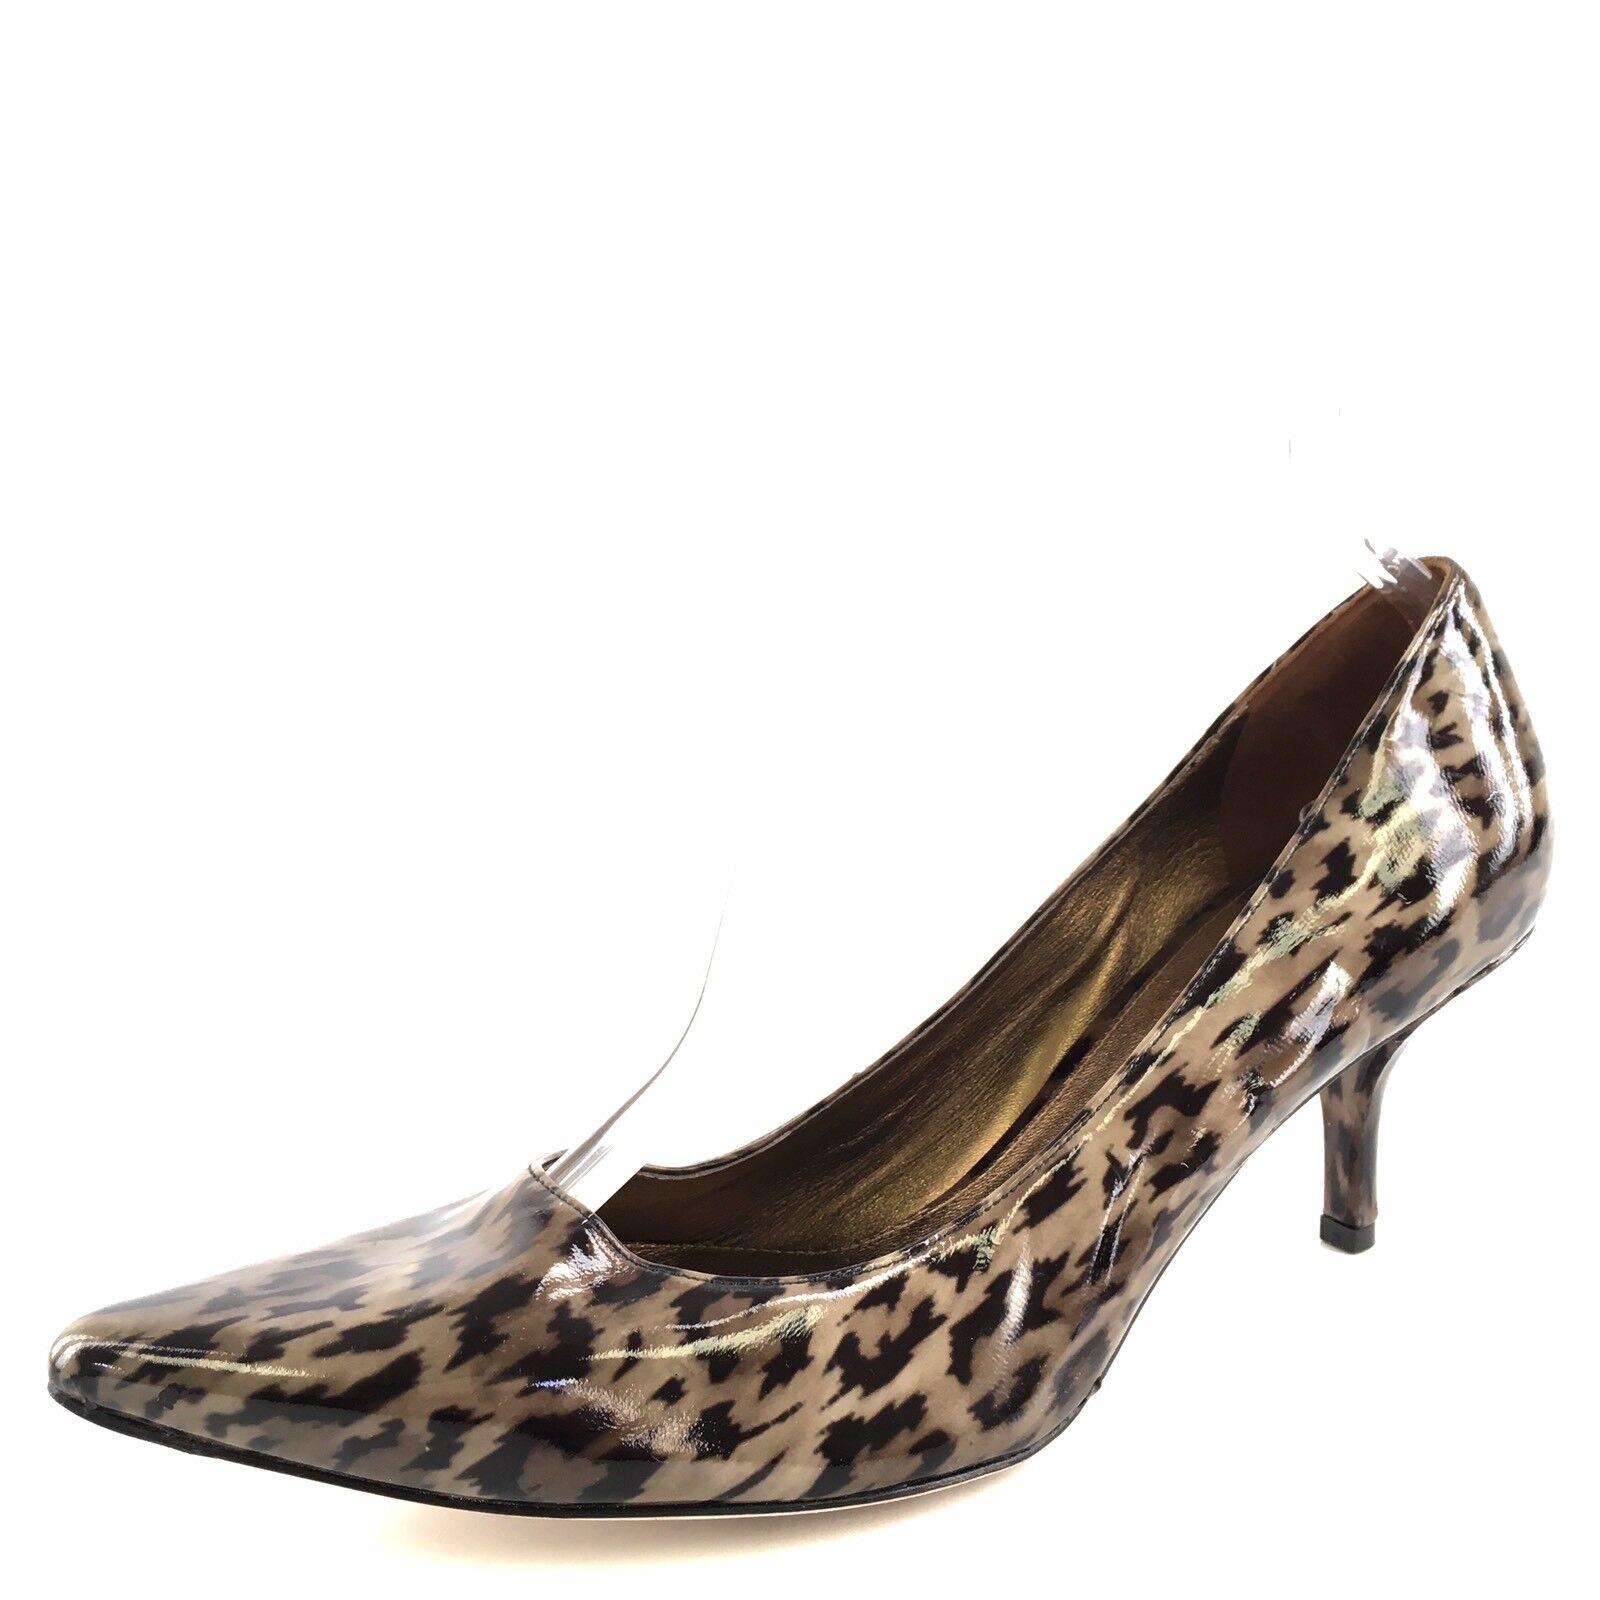 NEU Via Spiga Carola Leopard Print Leder Pointy Toe Pumps Damenschuhe Größe 10.5 M